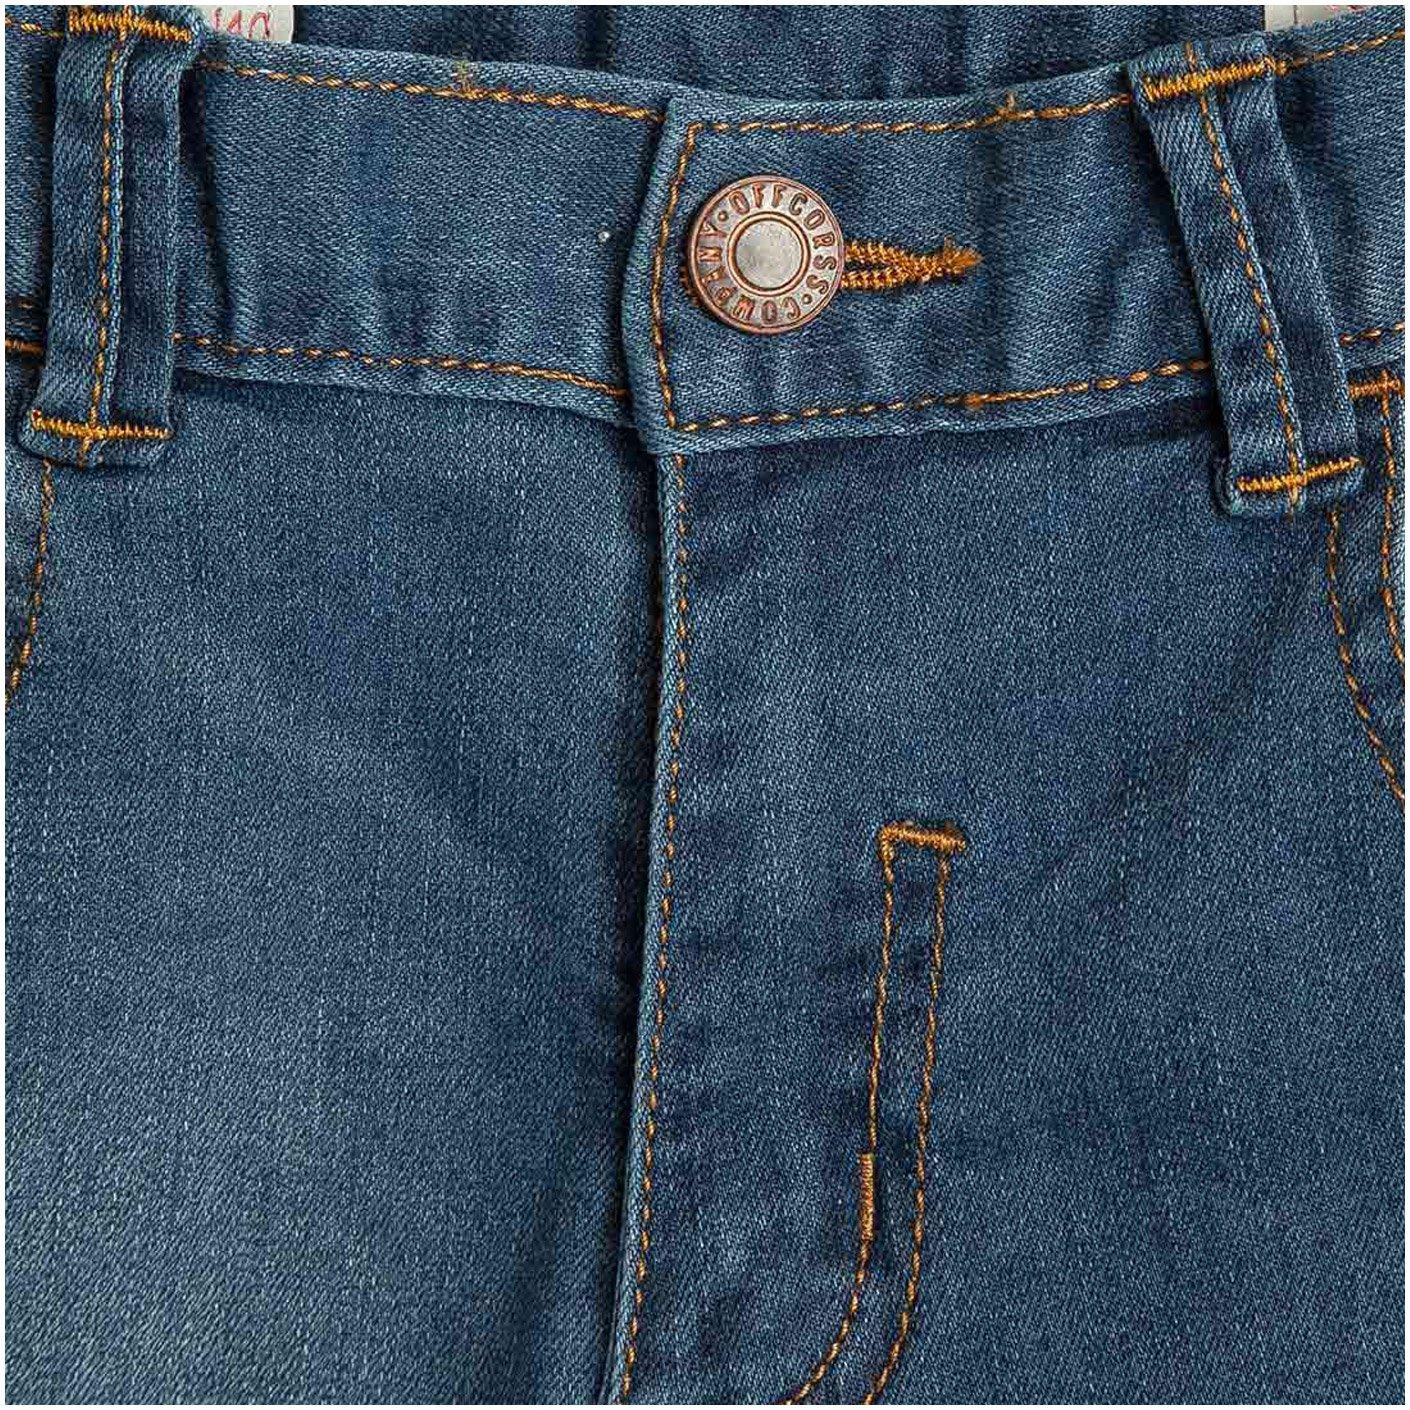 Pantalones de Ni/ño OFFCORSS Big Boys Slim Fitted Skinny Dress Pants